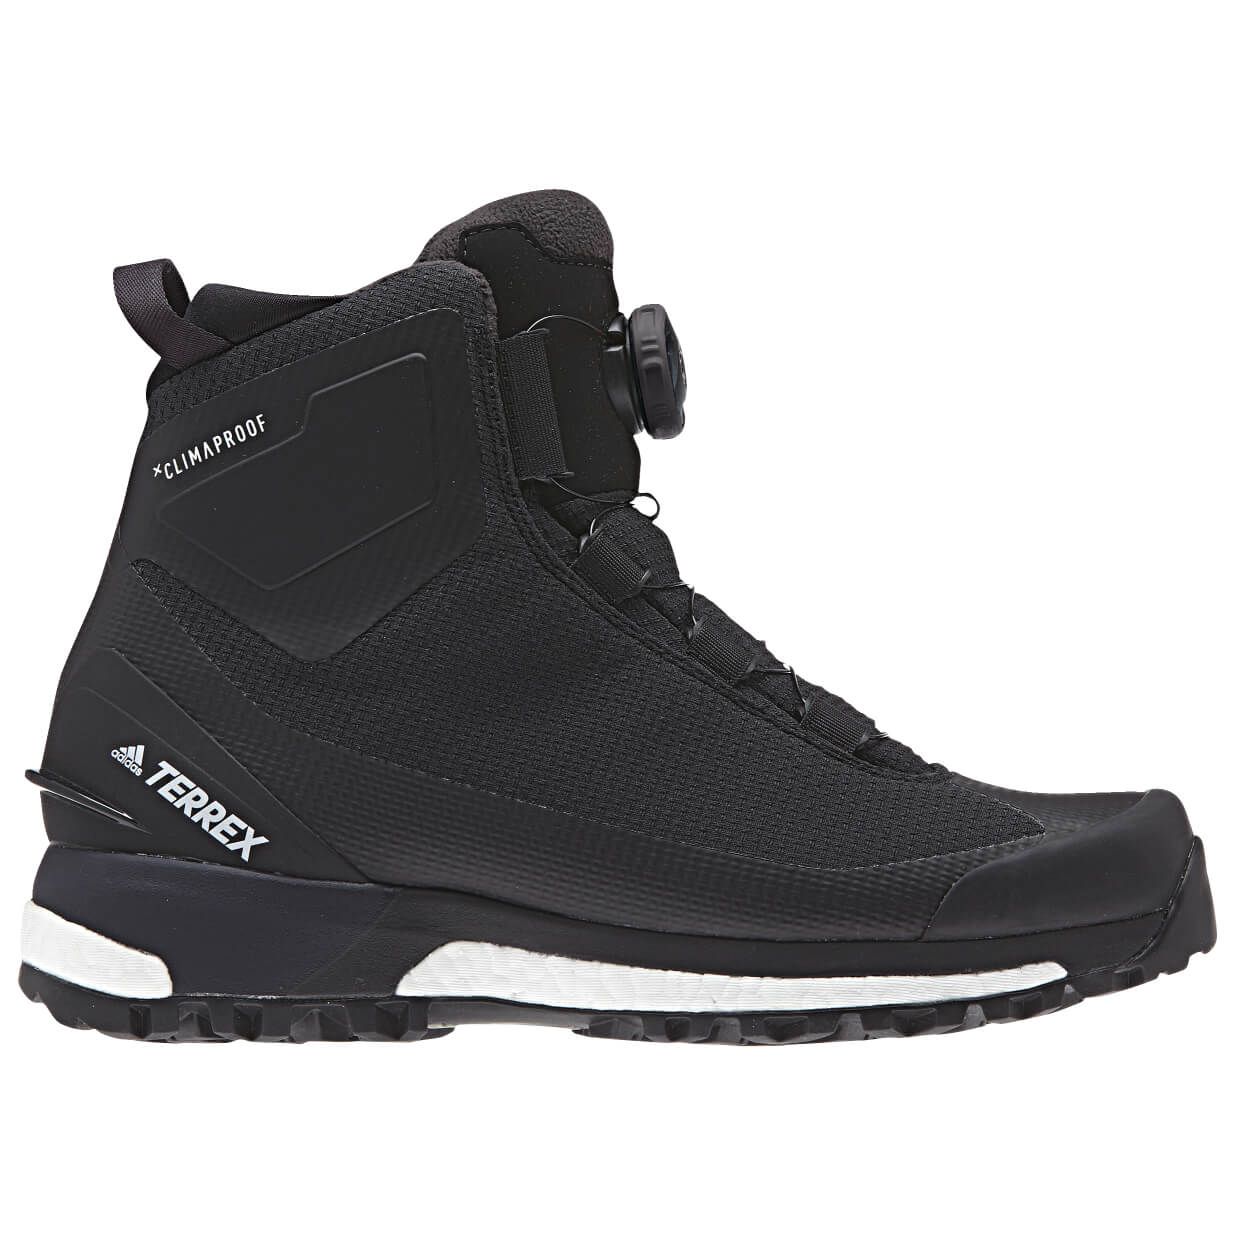 Adidas Outdoor Terrex Conrax CH CP Winter Boot Men's